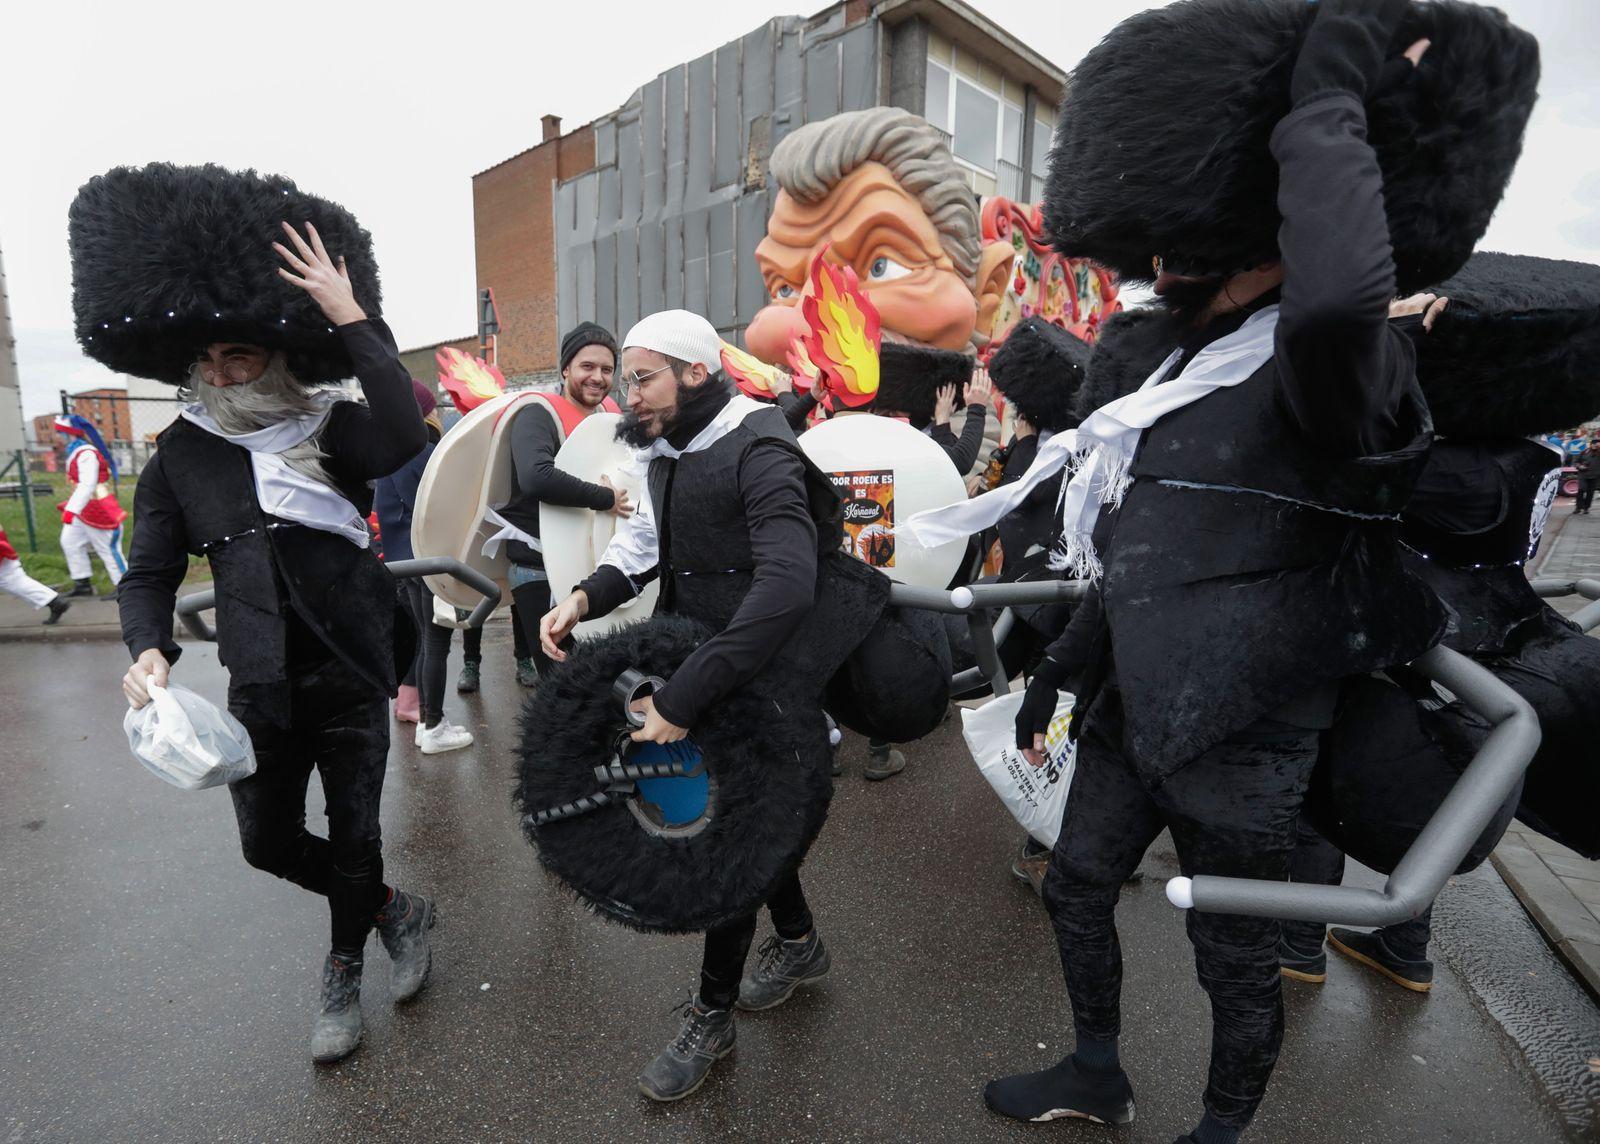 Carnaval in Aalst to go ahead as planned, Brussels, Belgium - 23 Feb 2020